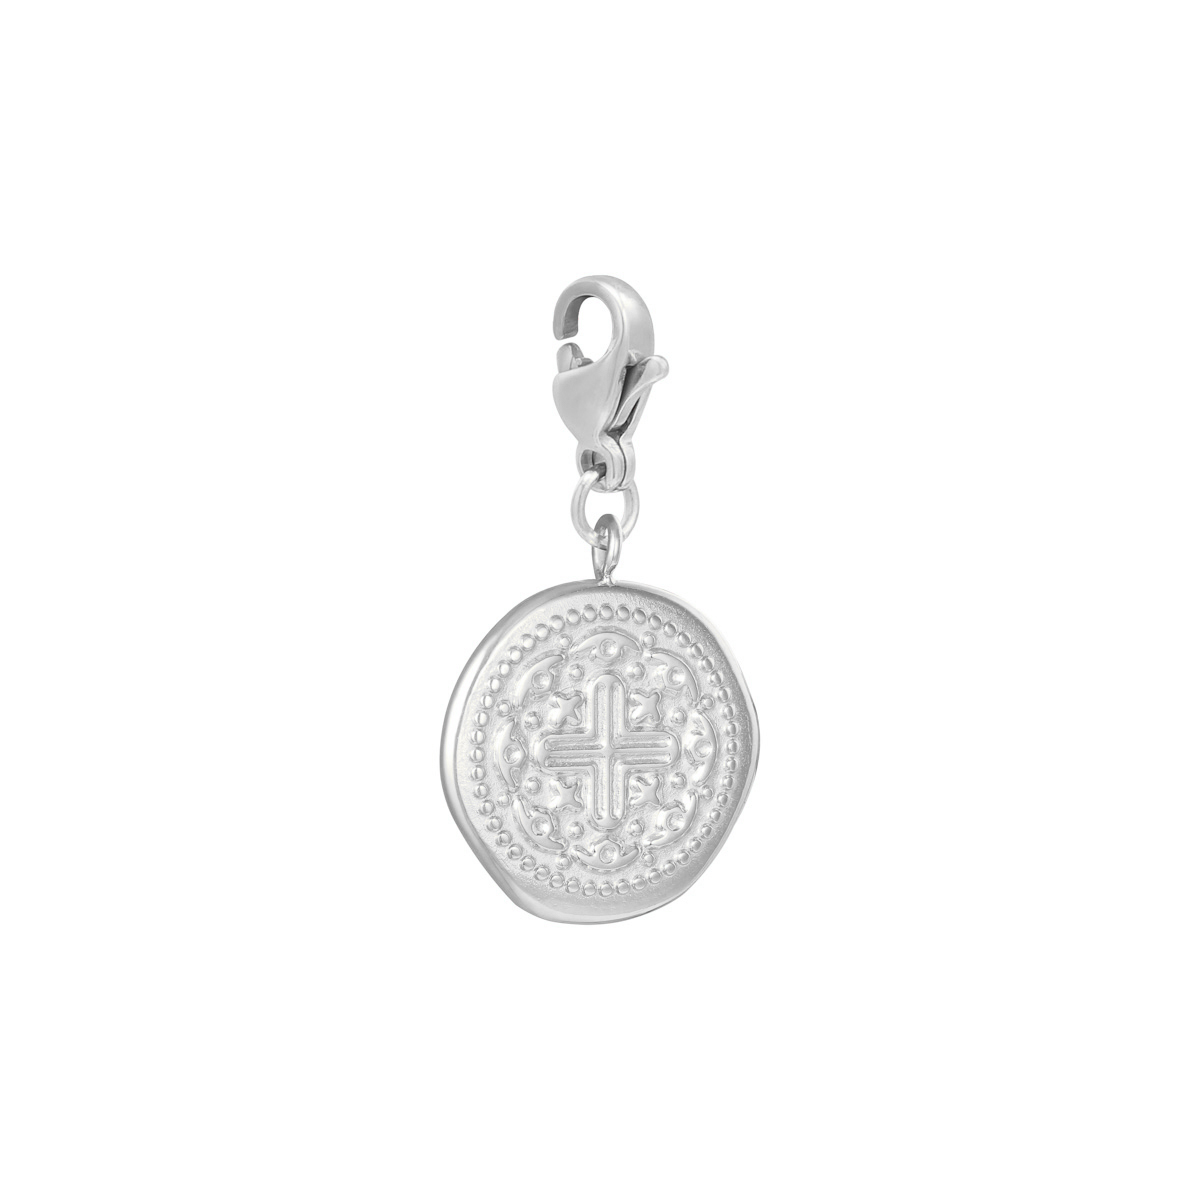 Diy clasp charm cross coin